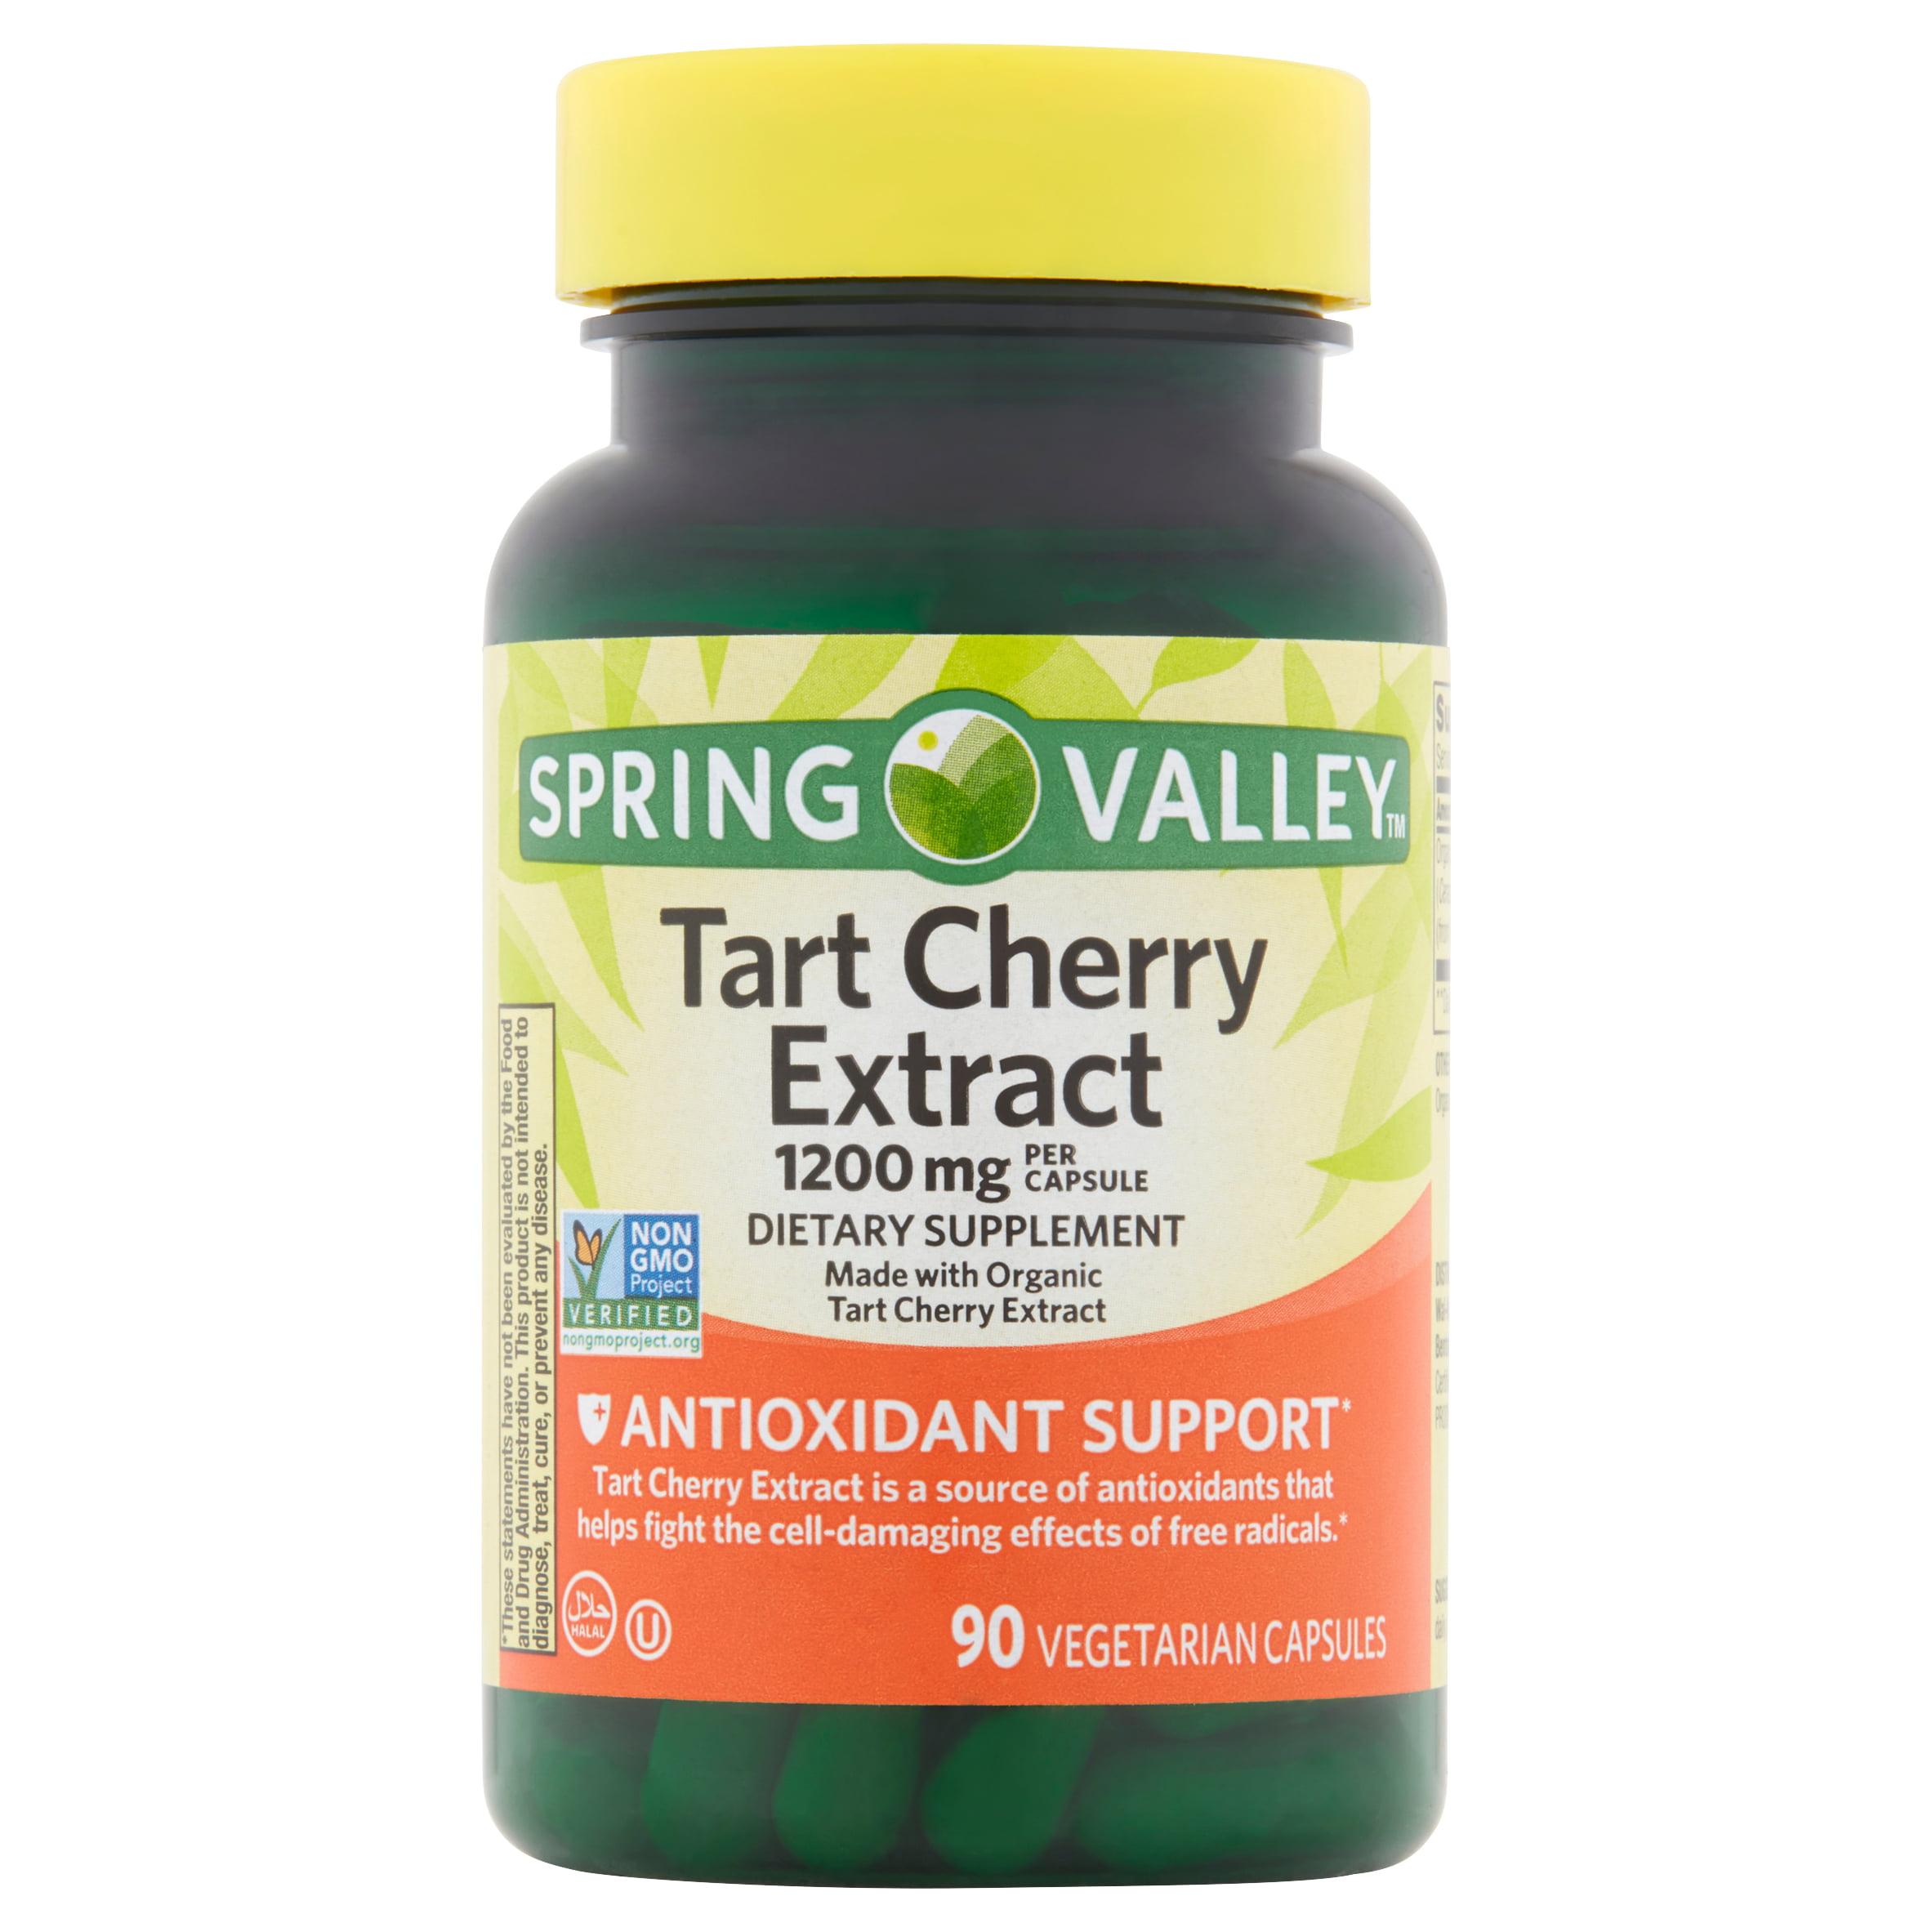 Spring Valley Tart Cherry Extract Vegetarian Capsules, 1200